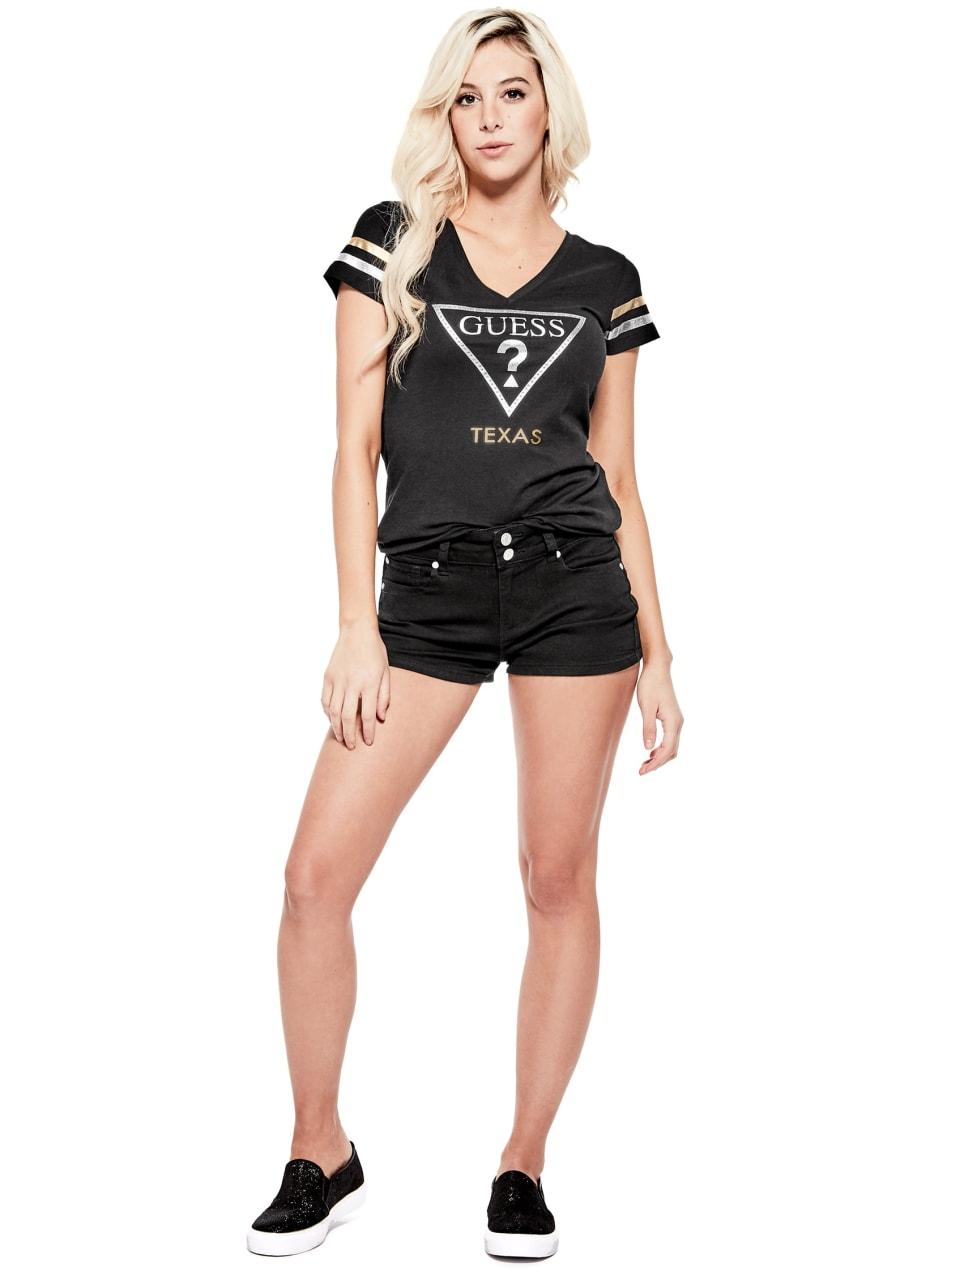 GUESS-Factory-Women-039-s-Texas-City-V-Neck-Varsity-Short-Sleeve-Tee thumbnail 8